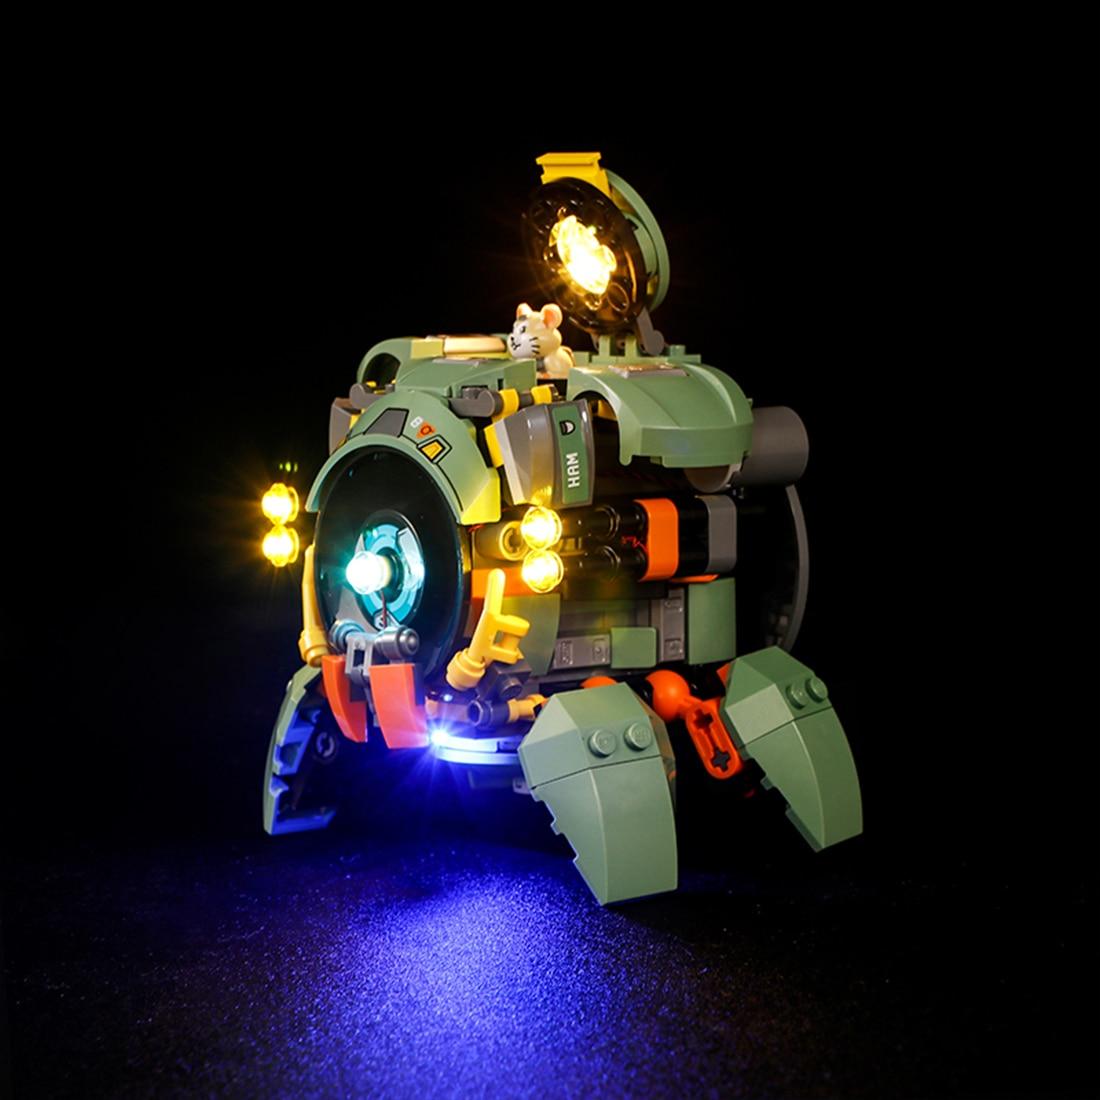 Vonado USB LED Lighting Kit For Overwatch Wrecking Ball 75976(LED Included Only, No Kit) Toy For Children Educational Toys Gift 4